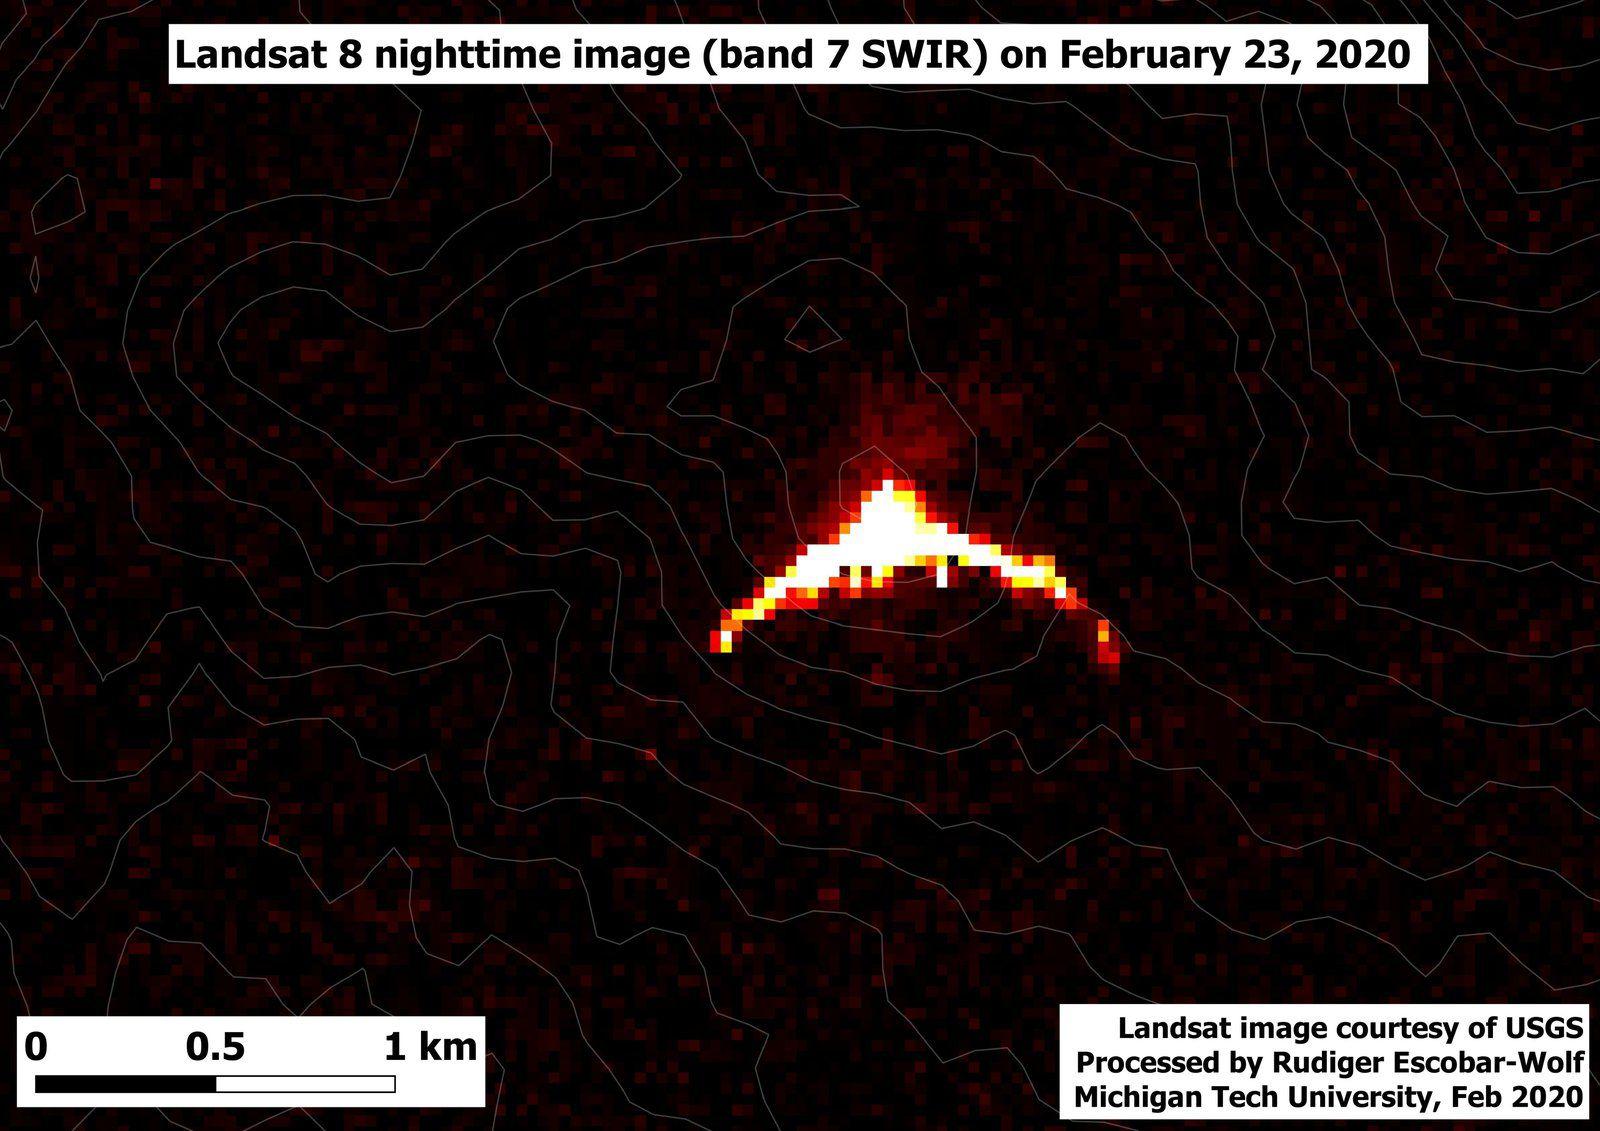 Santiaguito - Landsat 8 bands 7 SWIR image from 23.02.2020 - via R.Escobar-Wolf / MTU